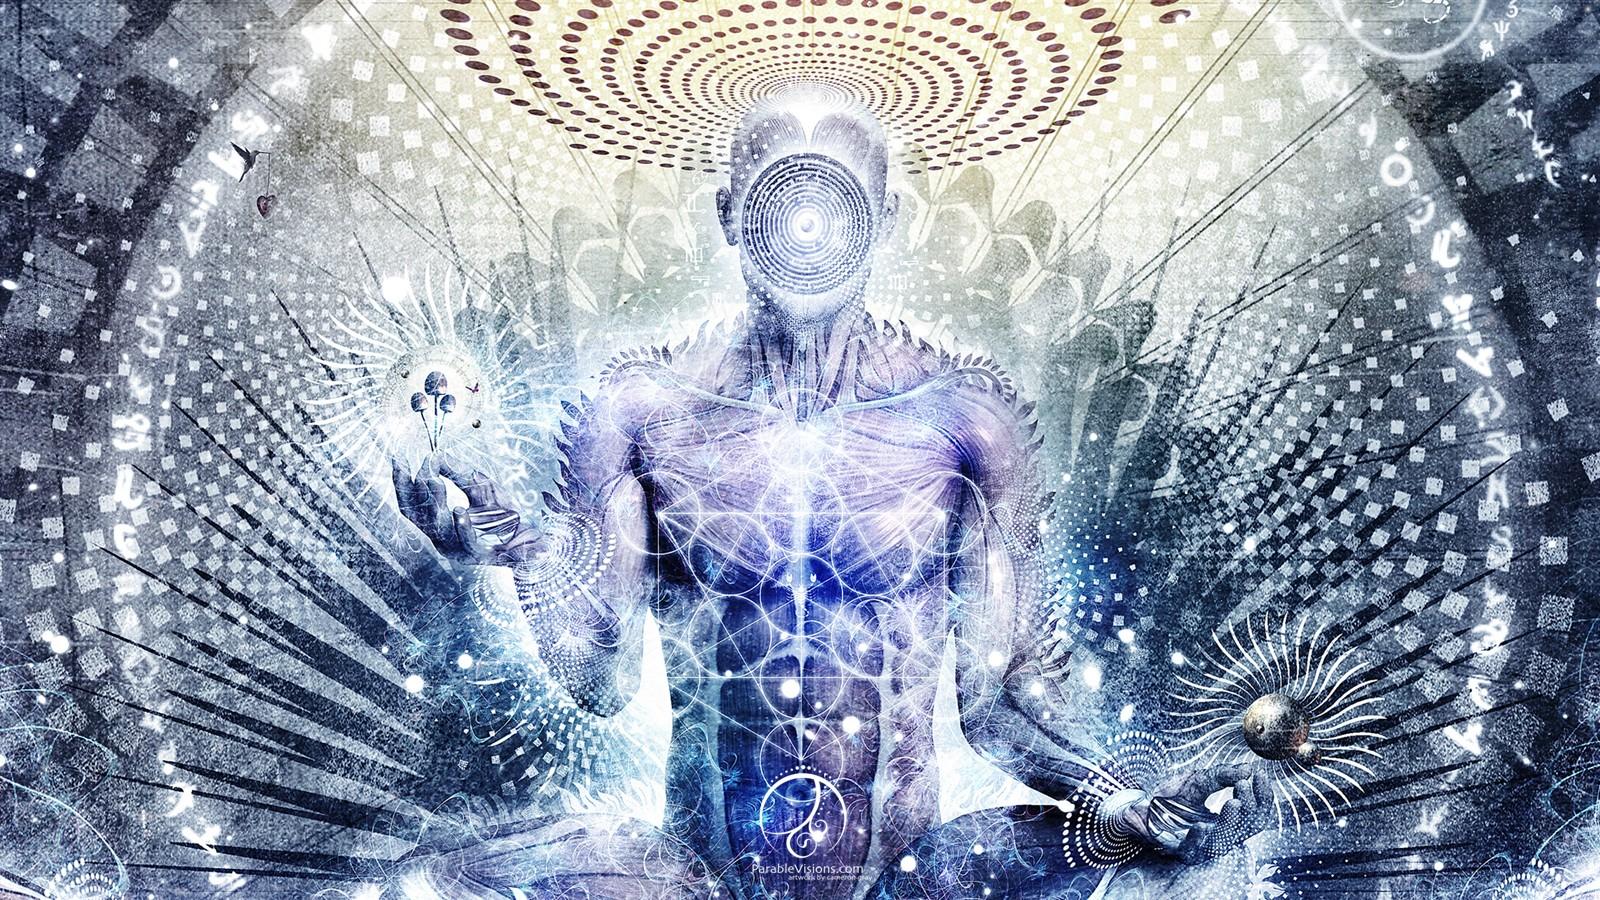 Fond Décran Illustration Méditation Spirituel Cameron Gray